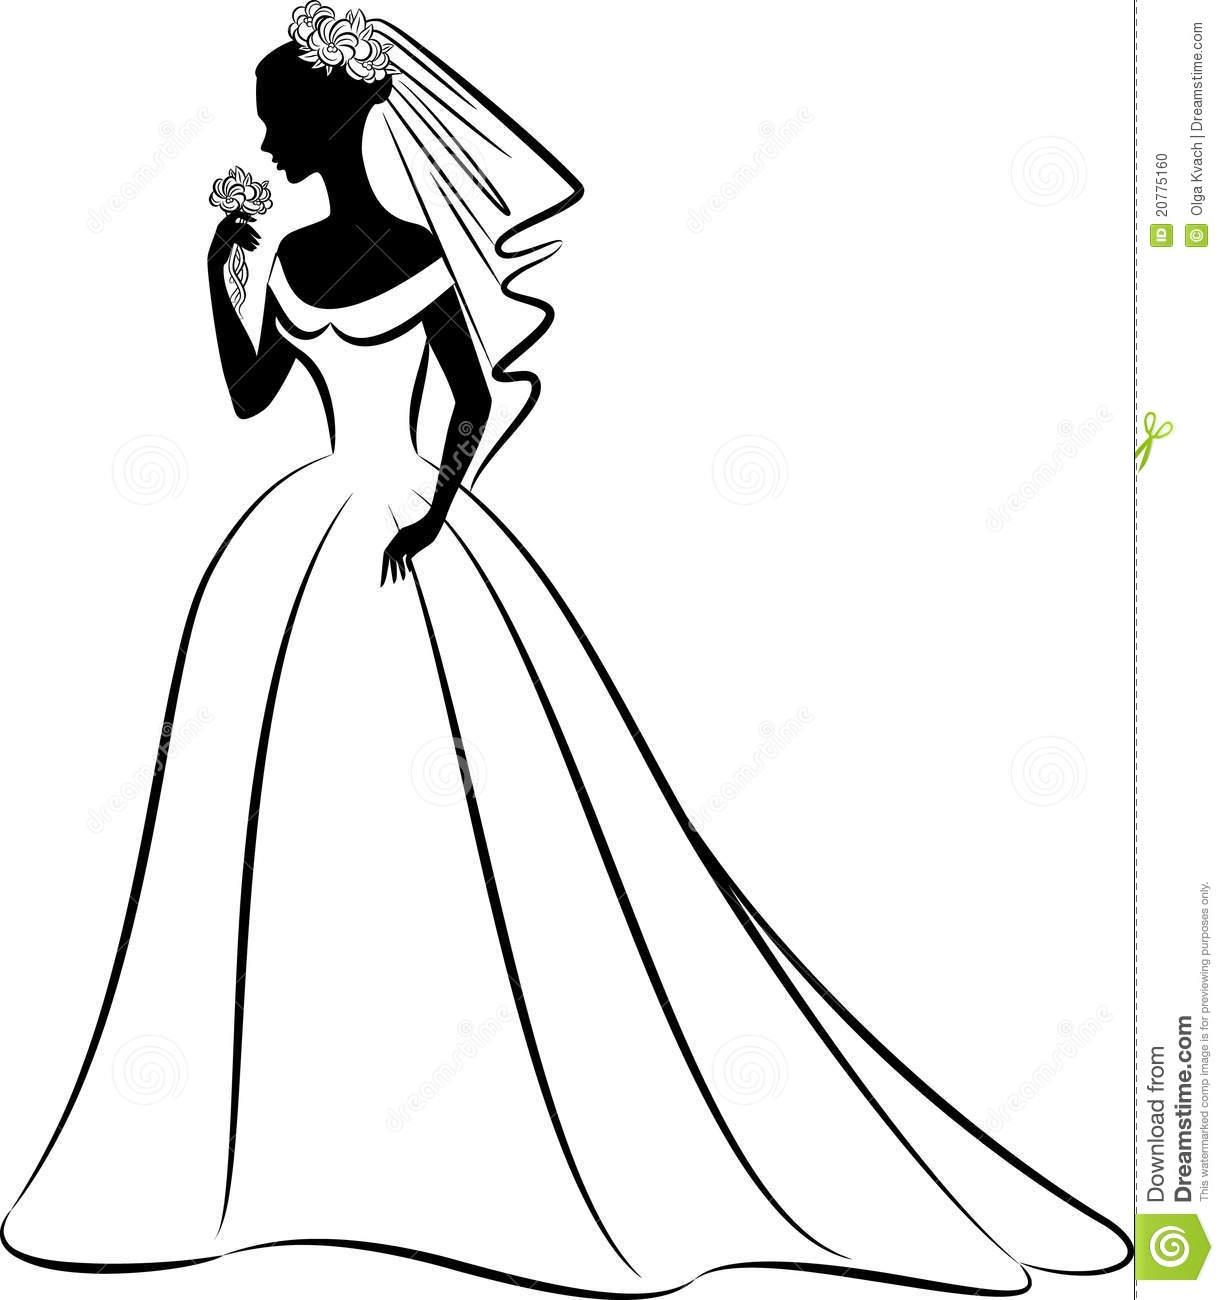 Bridal clipart. Best of bride design